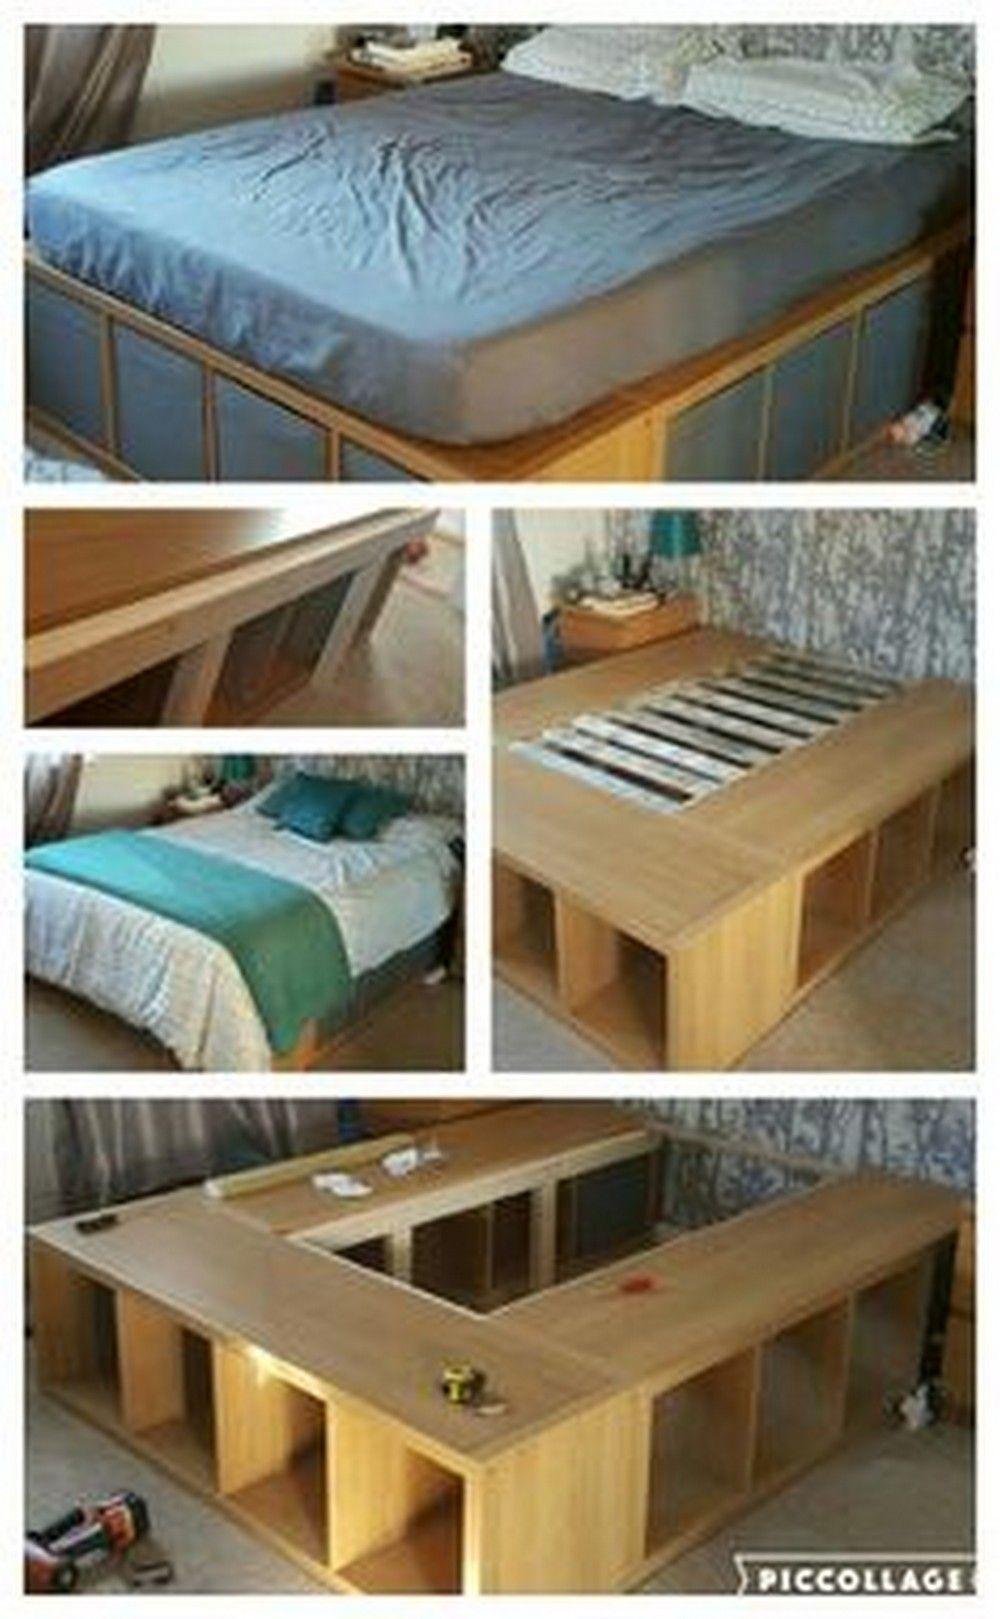 82 Incredible IKEA Hacks for Home Decoration Ideas | Cama cajón ...